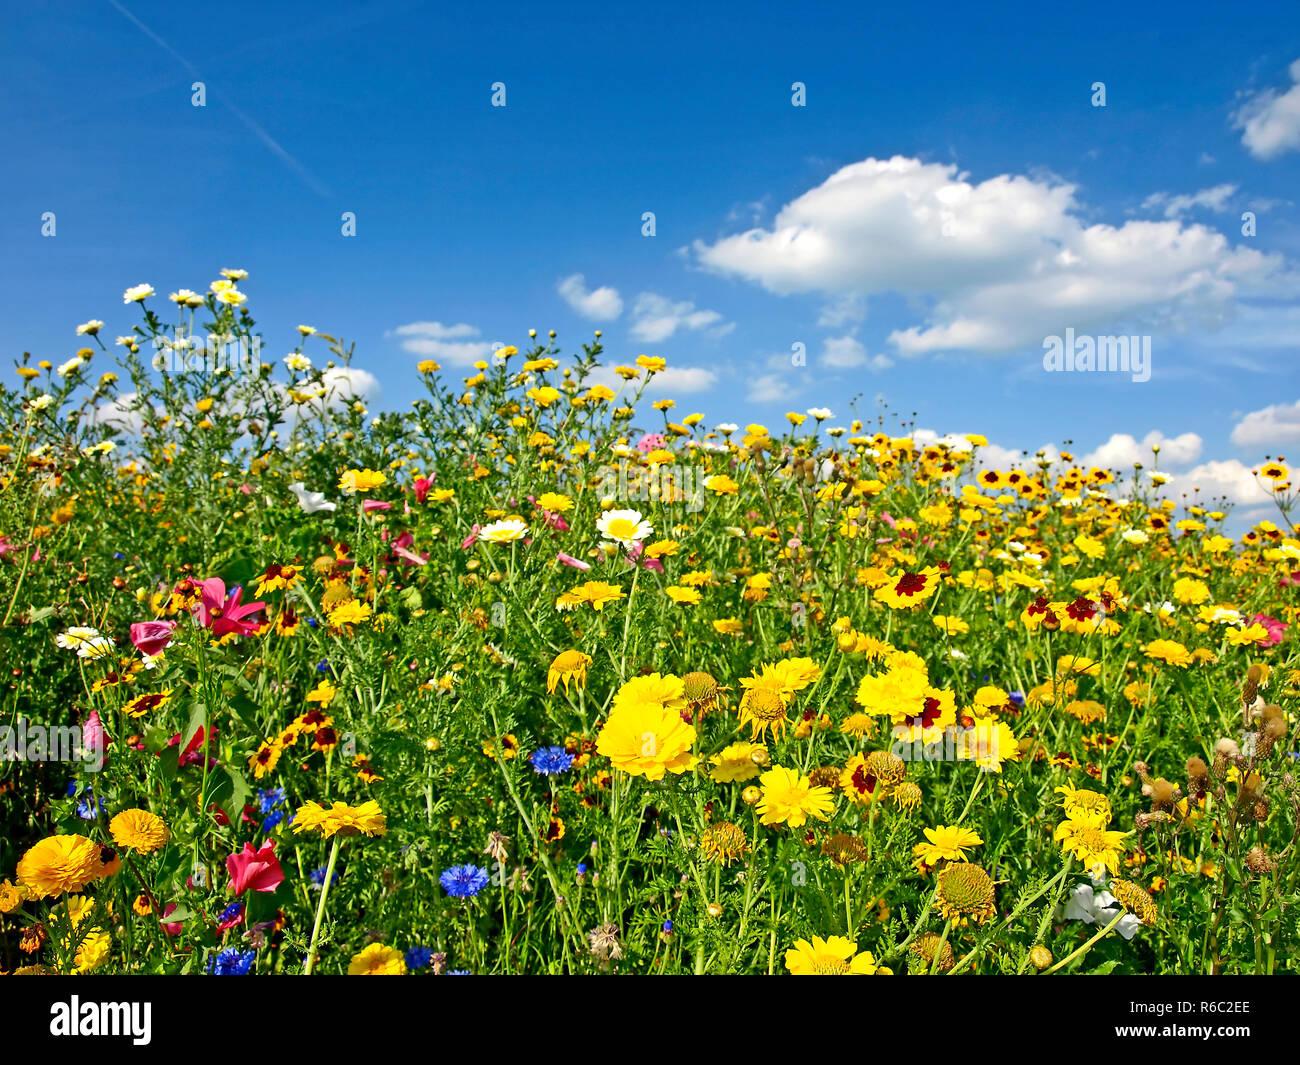 Bunte Blumenwiese - Stock Image